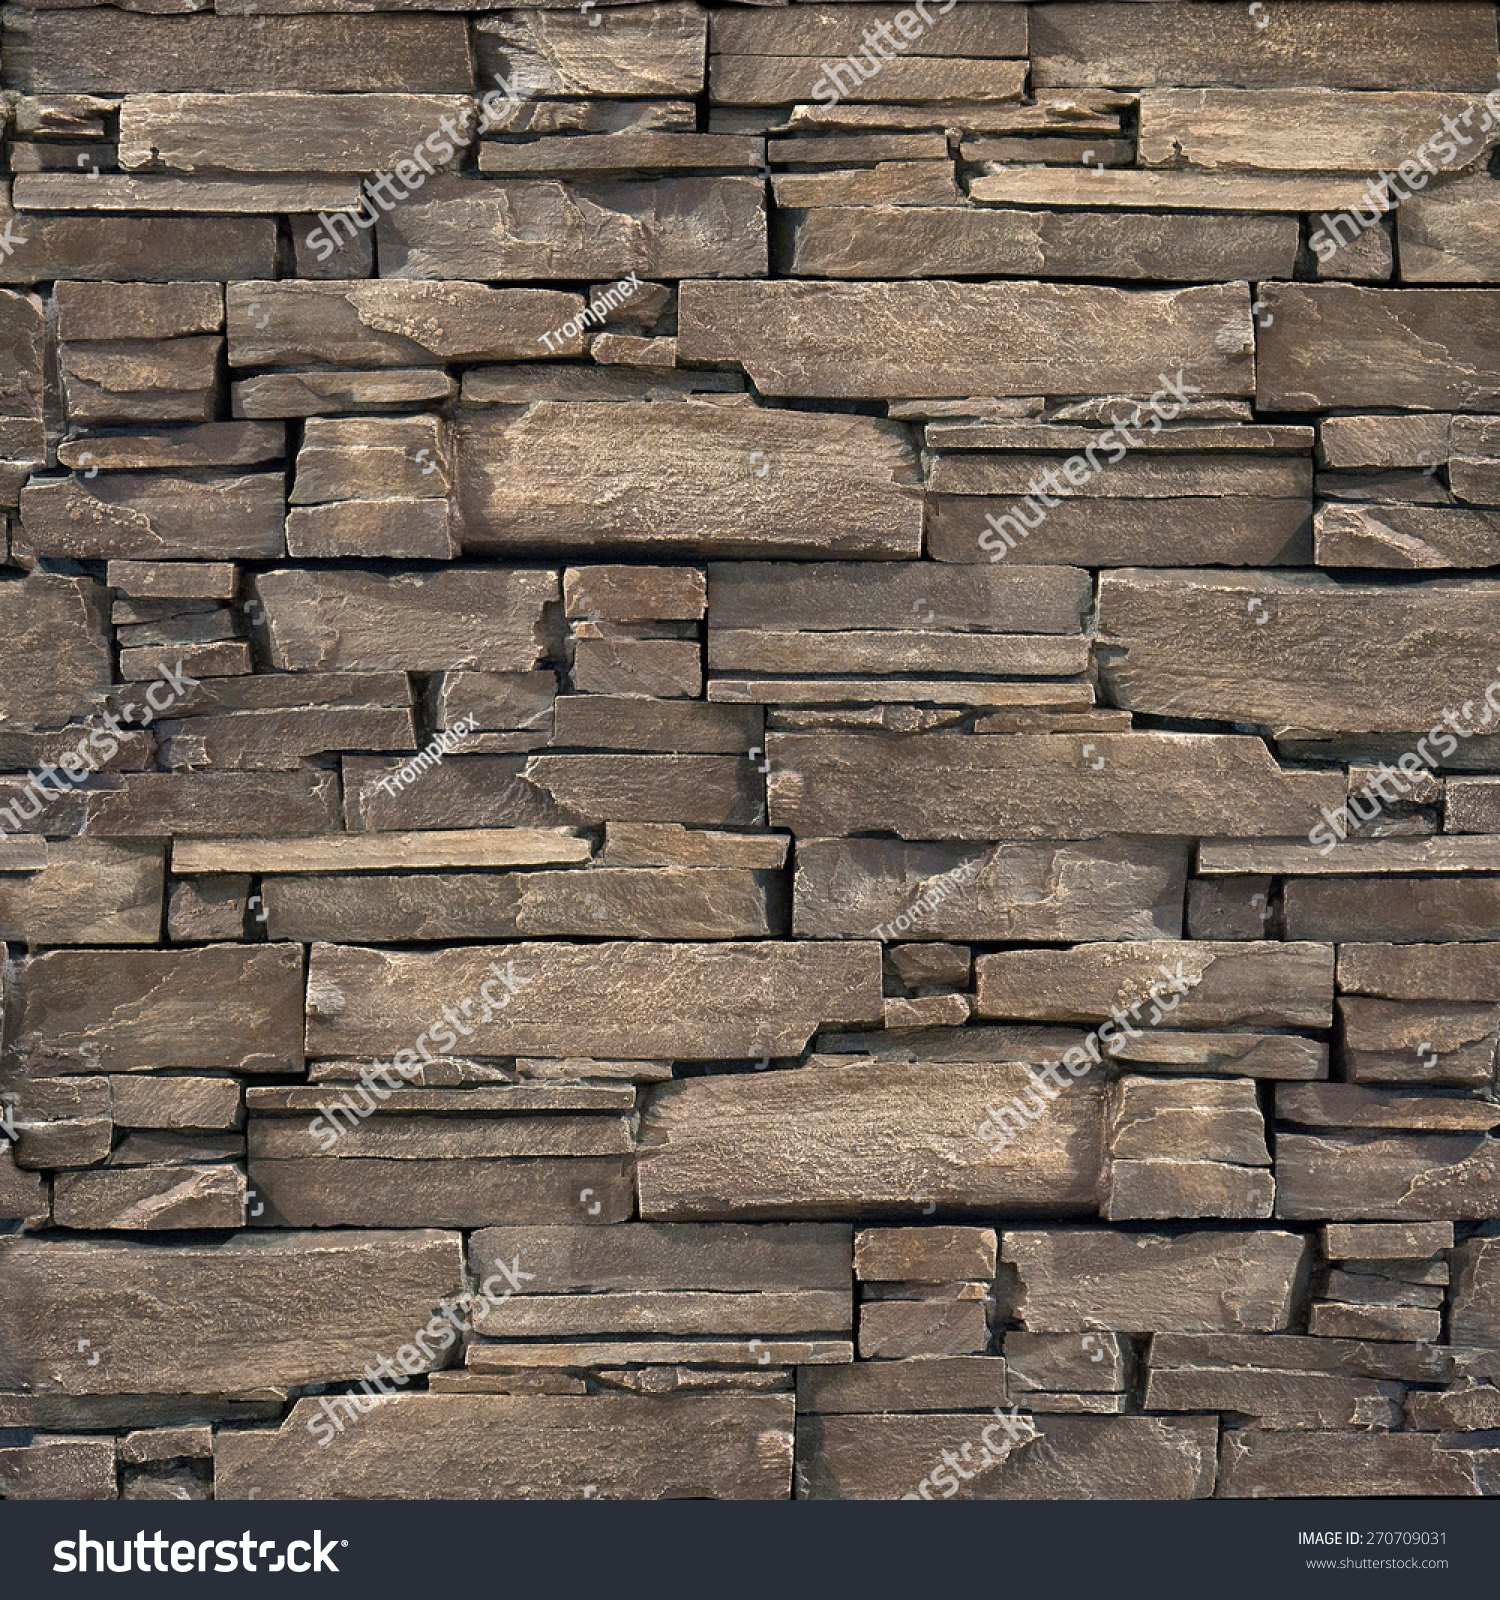 Decorative stone wall interior panel pattern design - Interior decorative stone wall panels ...